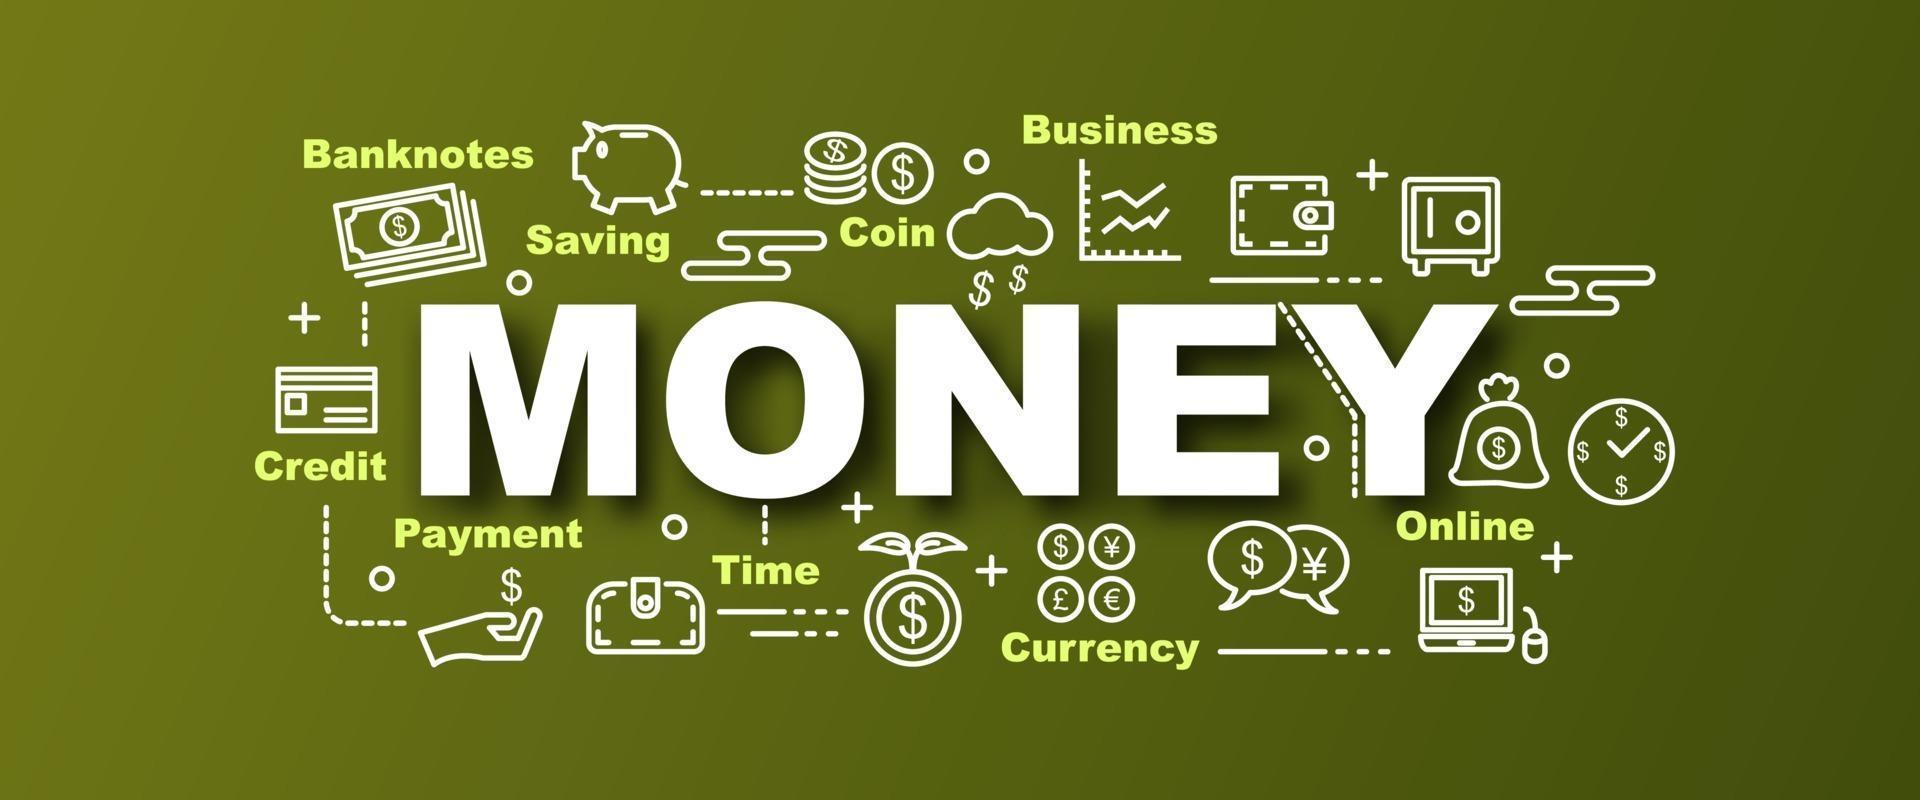 banner de moda de vector de dinero